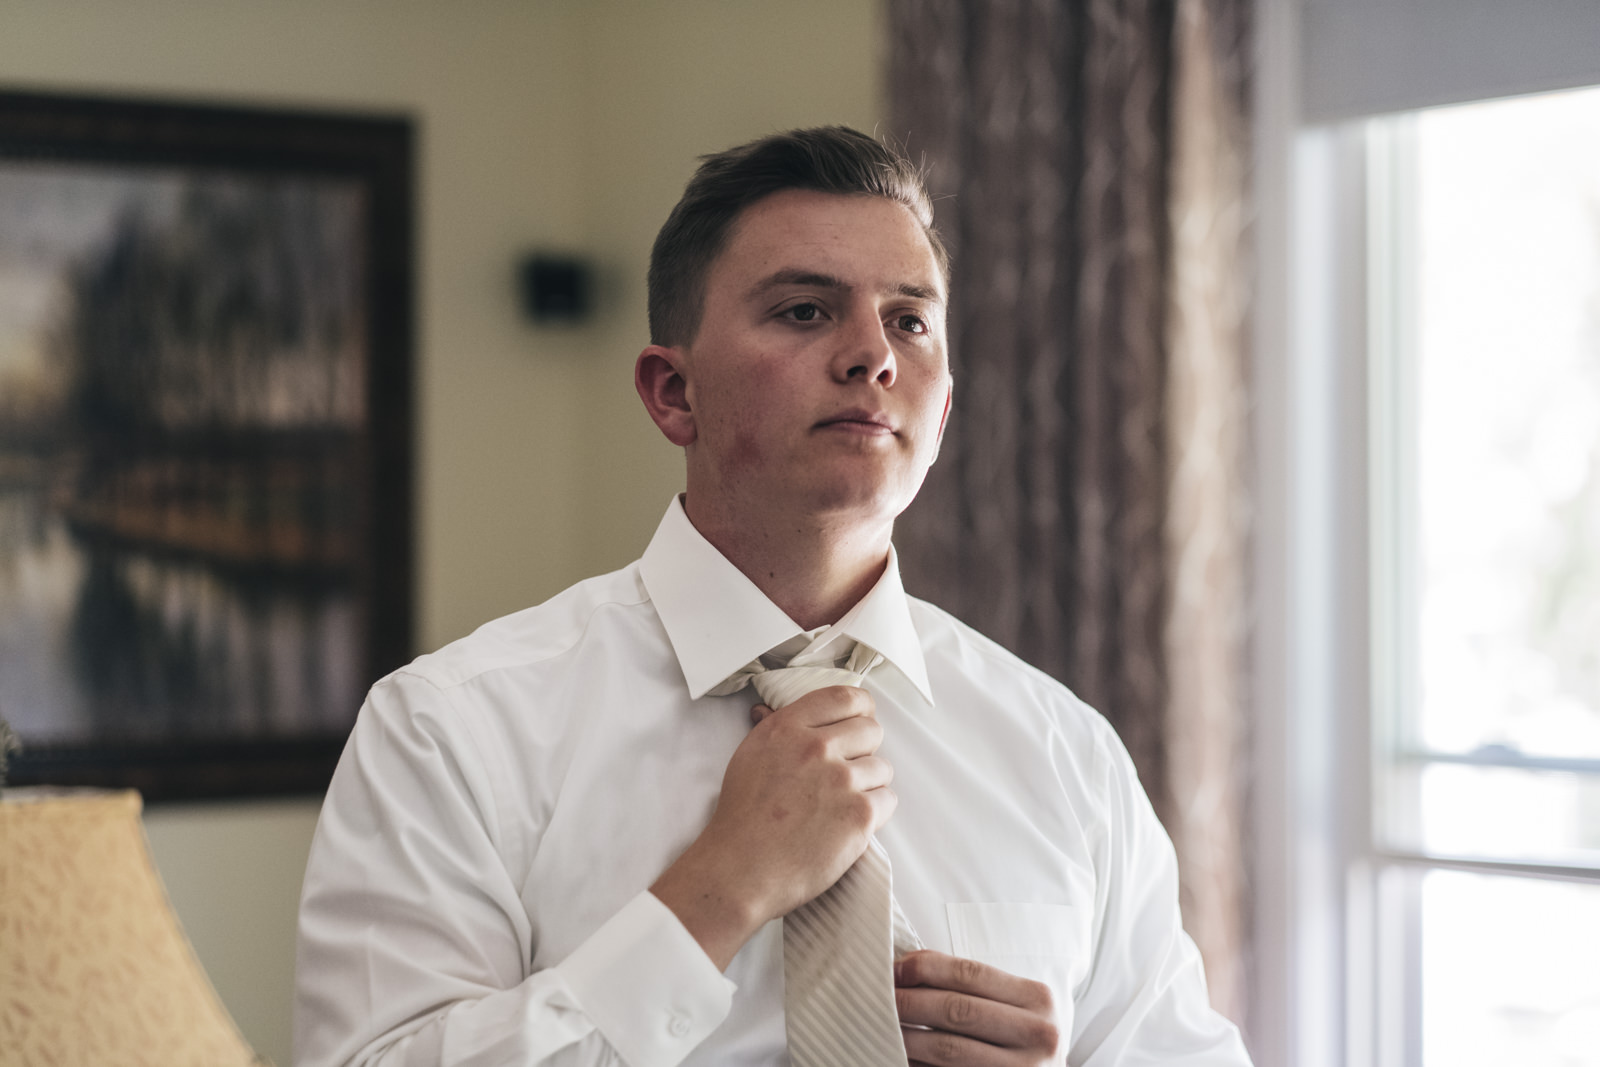 Groom getting ready on wedding day in Sylvania, Ohio.